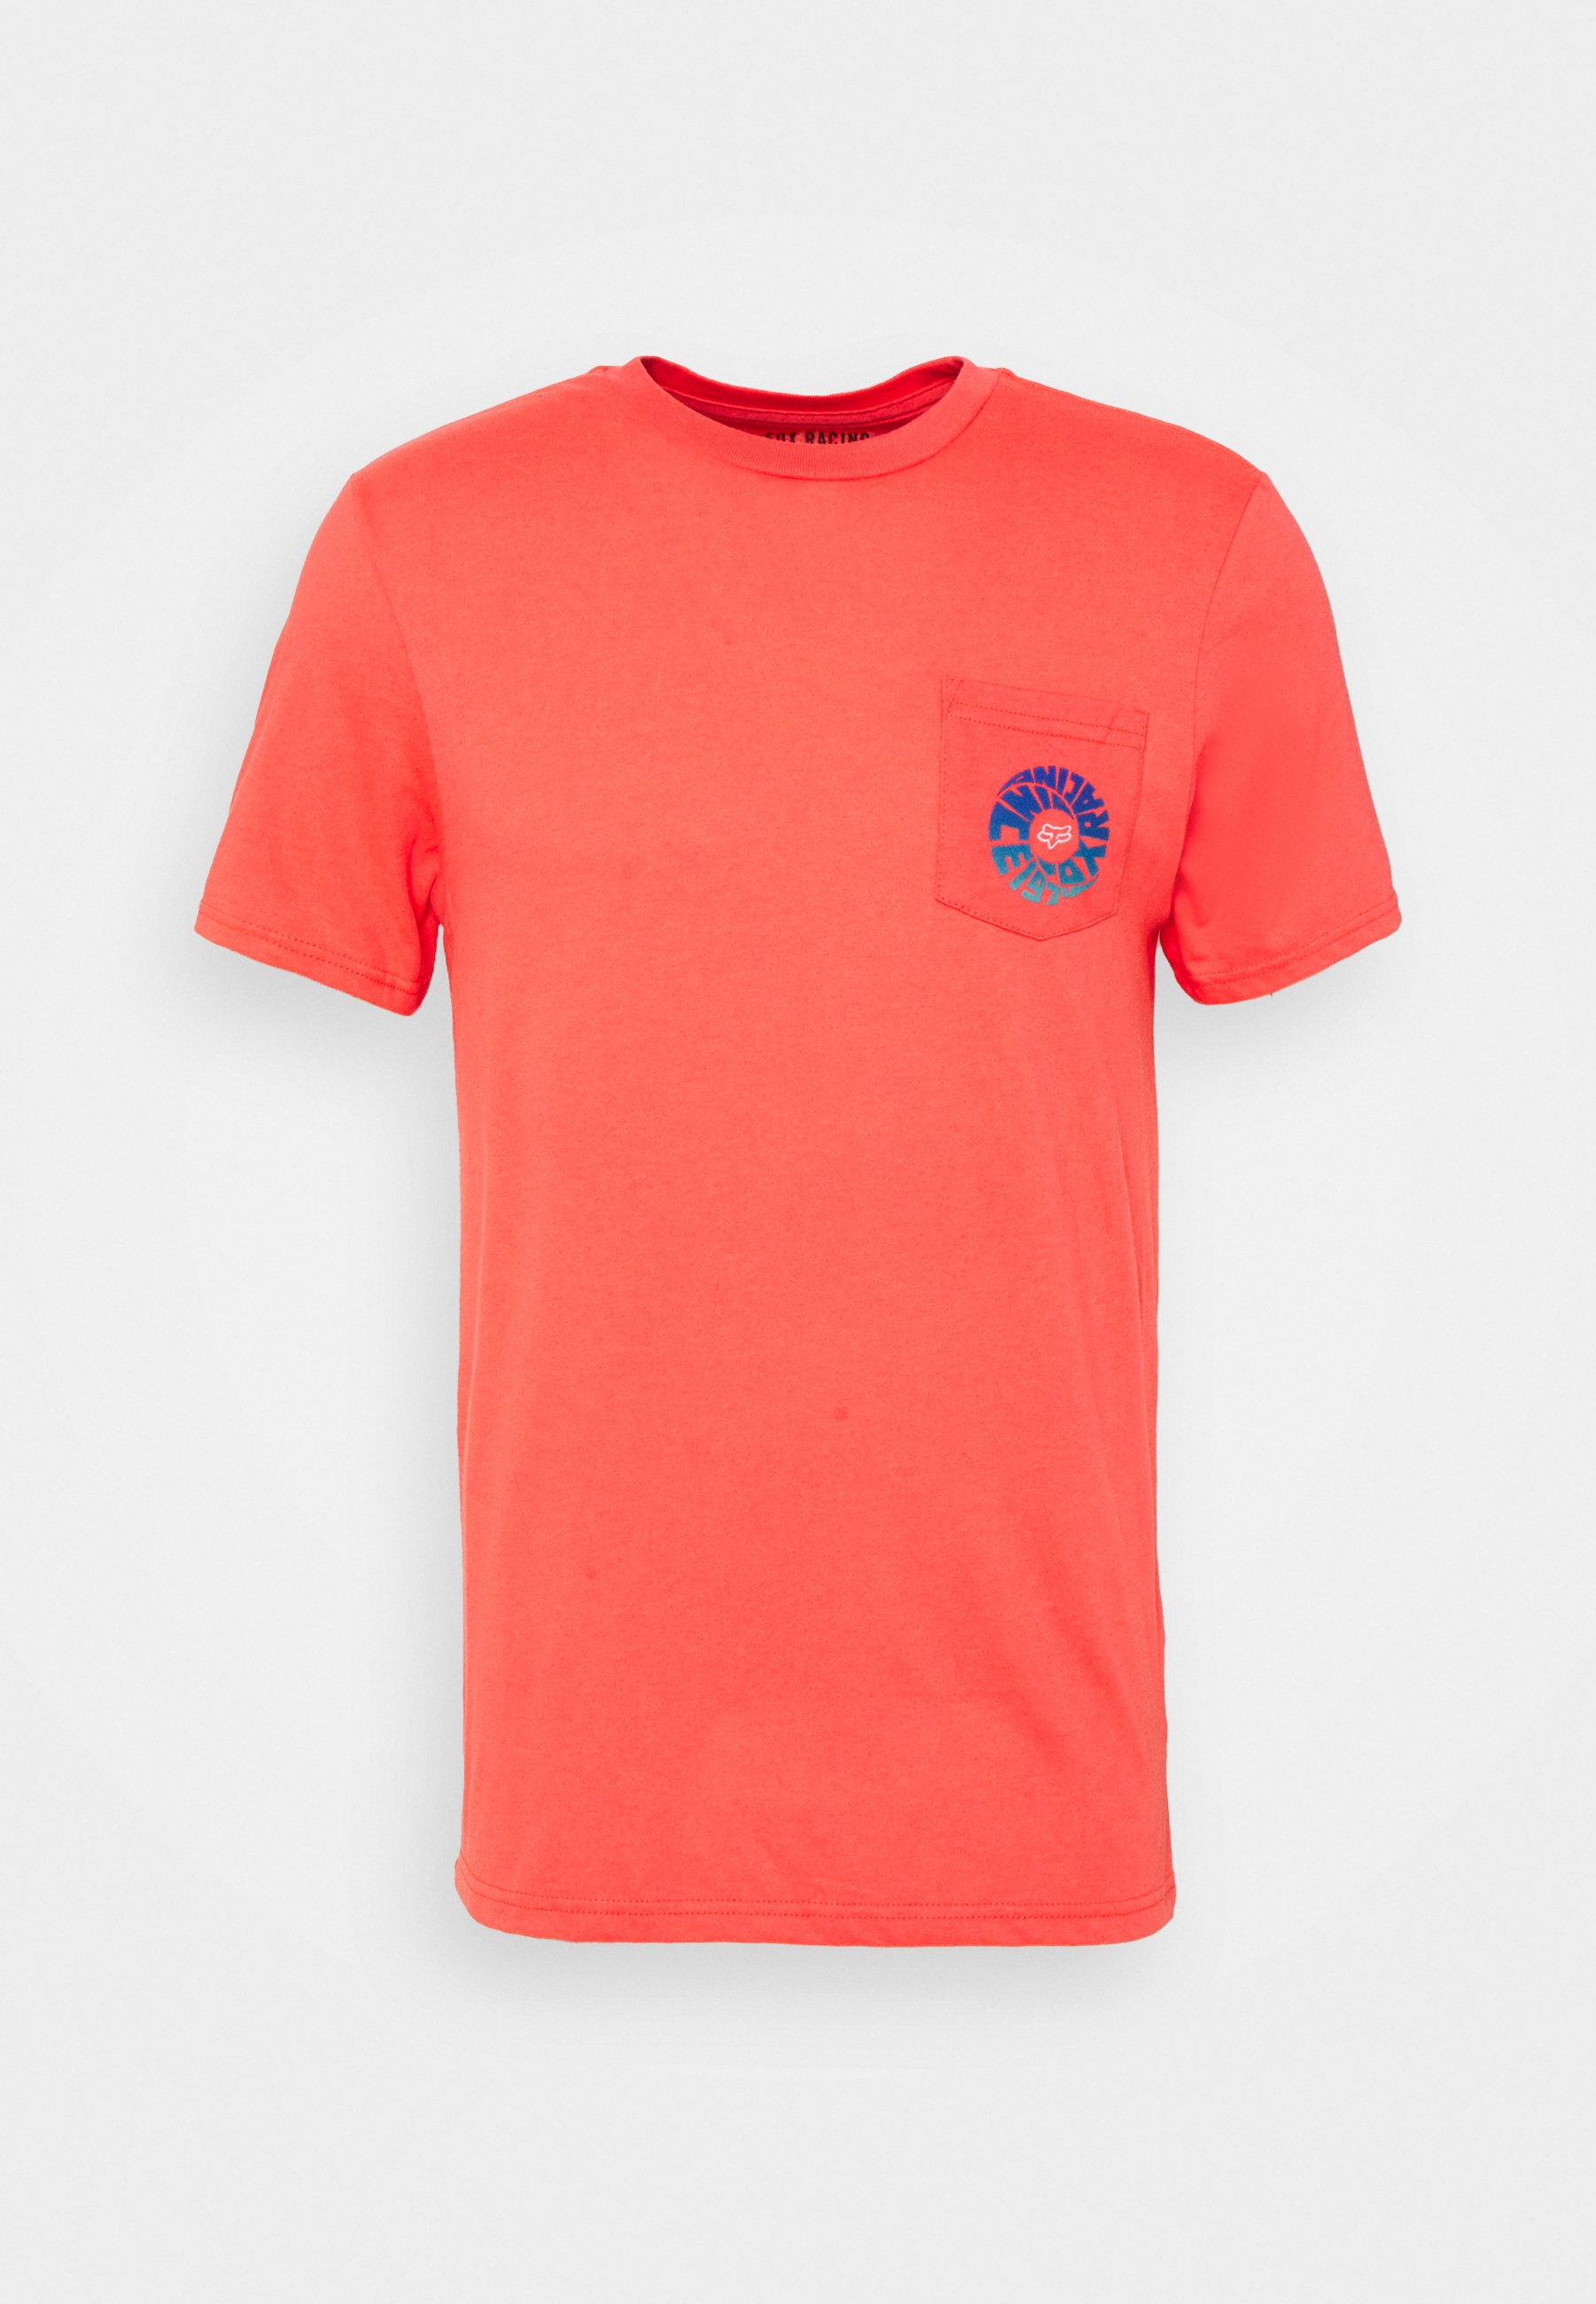 Homme REVOLVER POCKET TEE - T-shirt imprimé